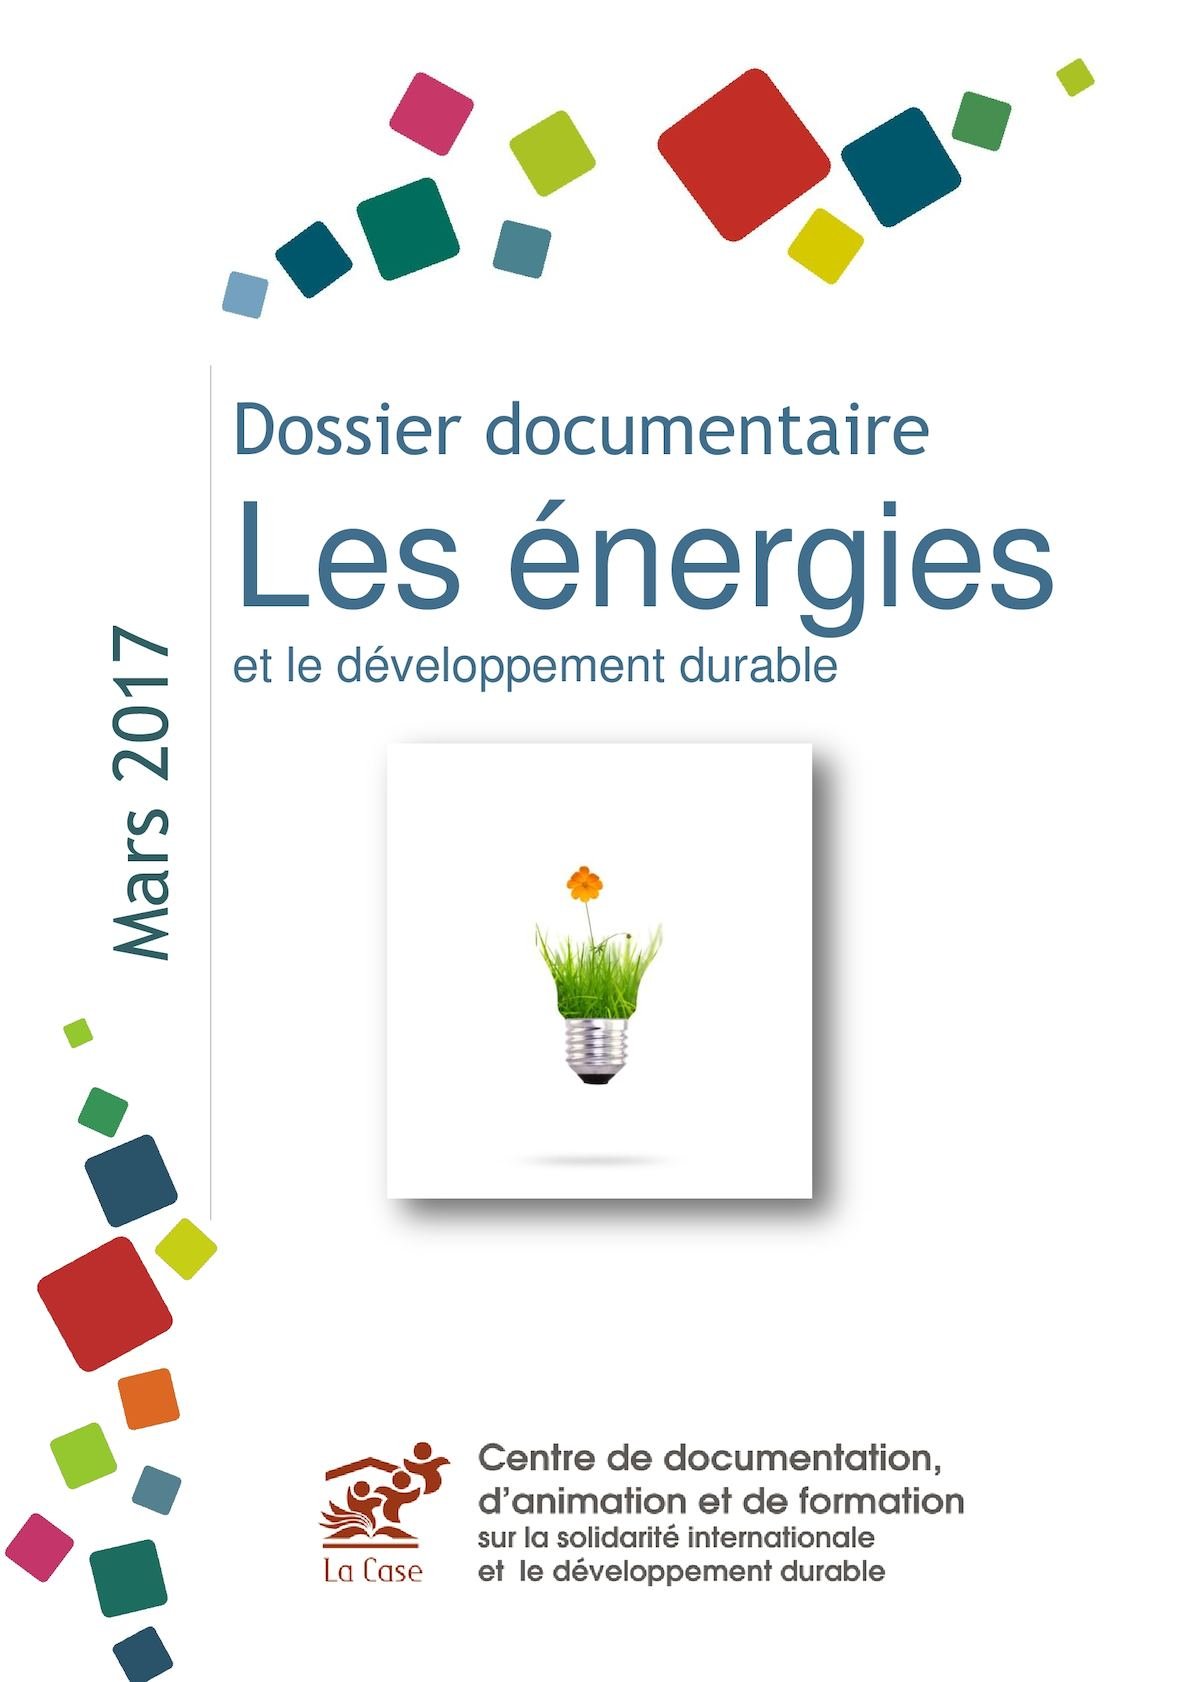 Calam o dossier documentaire les energies 2017 - Pacte energie solidarite 2017 ...